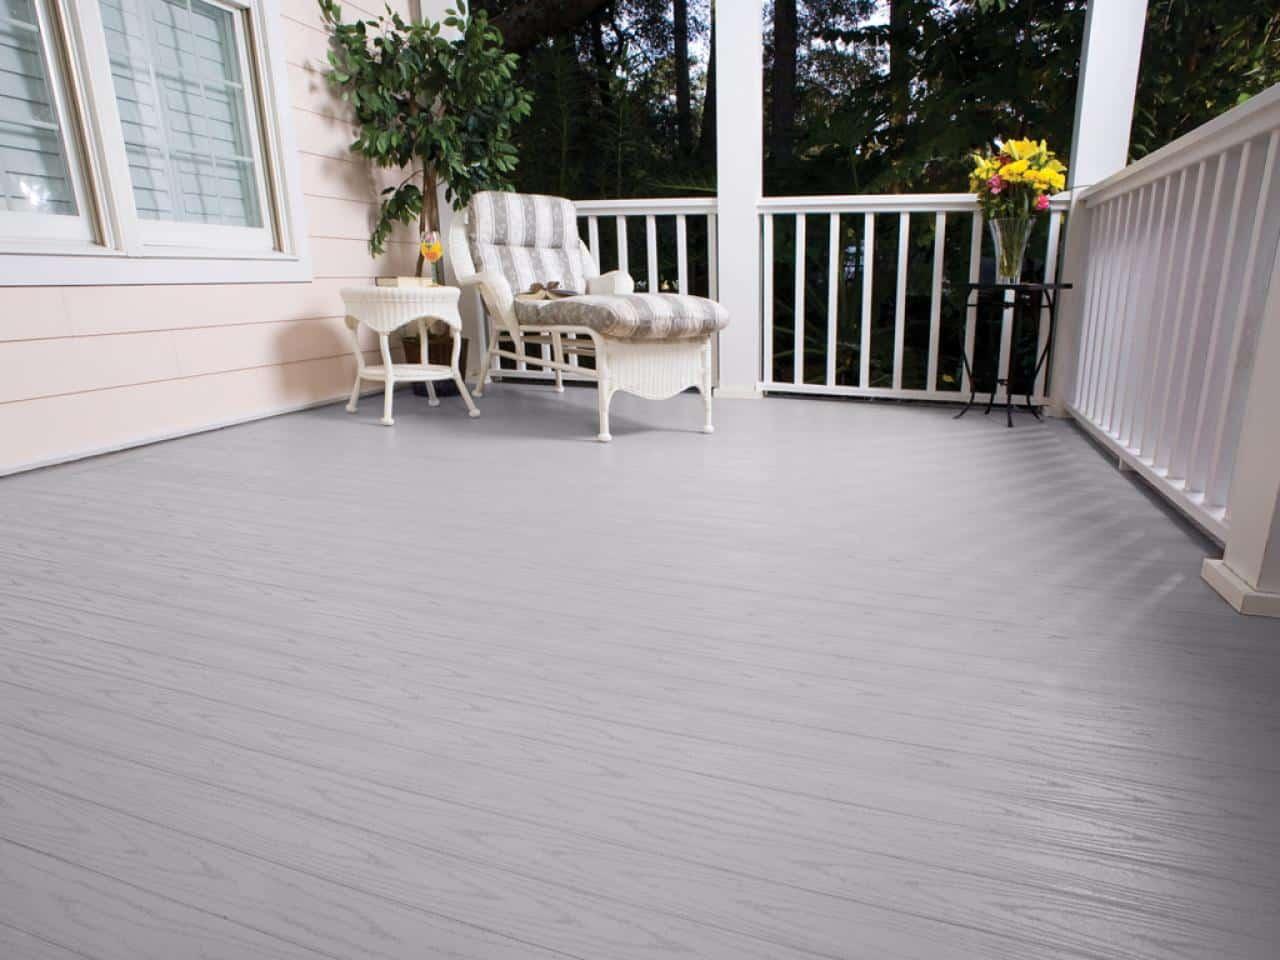 renovated deck porch